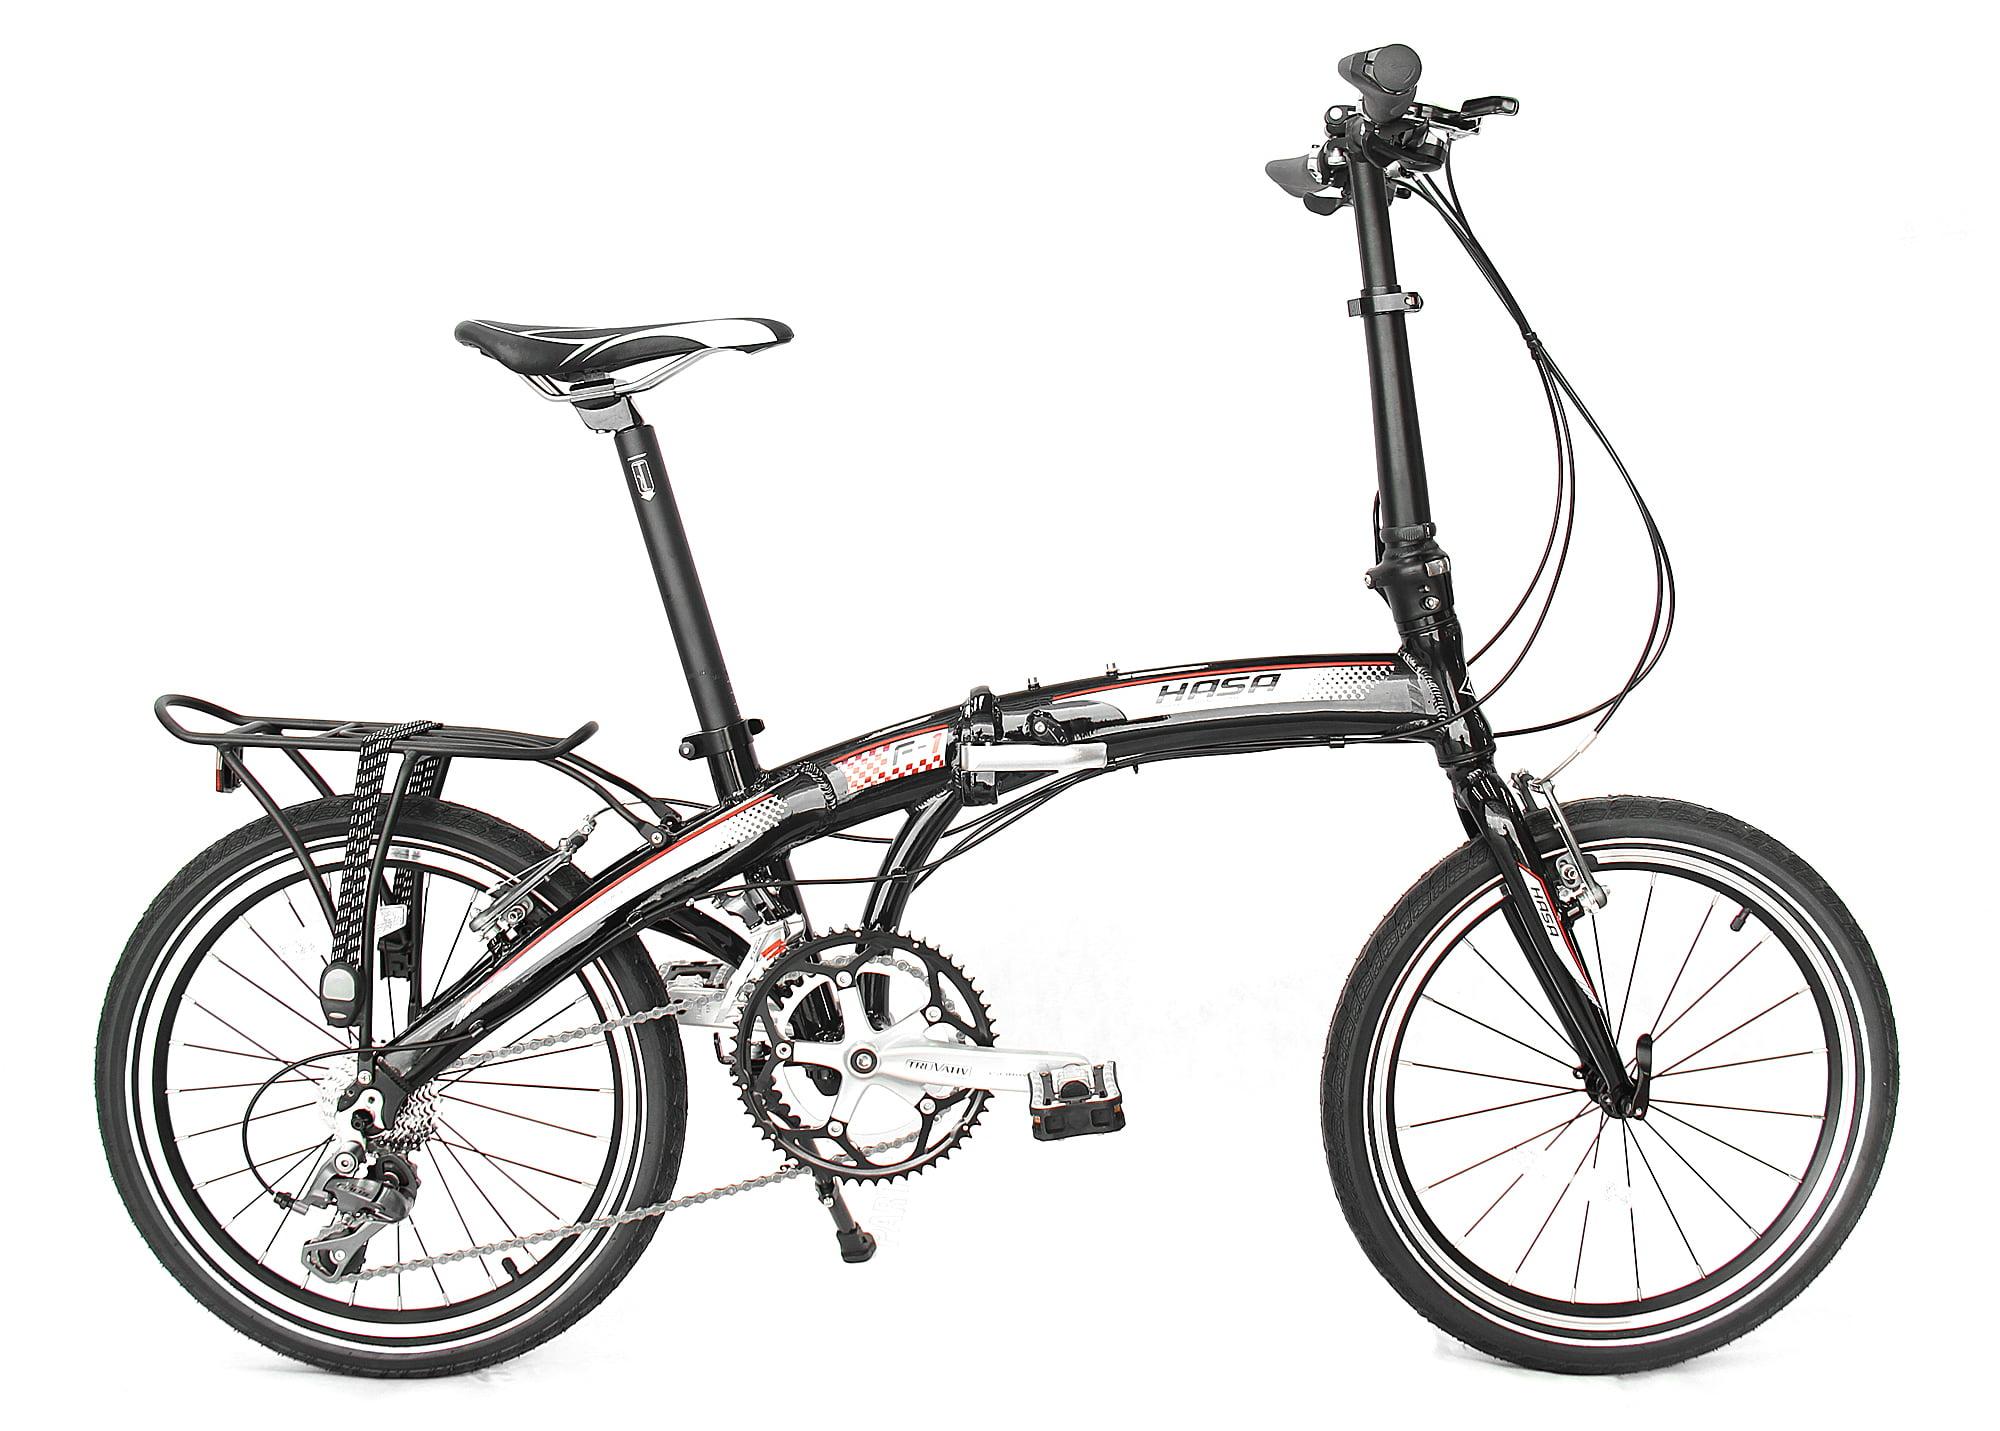 hasa folding foldable bike shimano 16 speed black